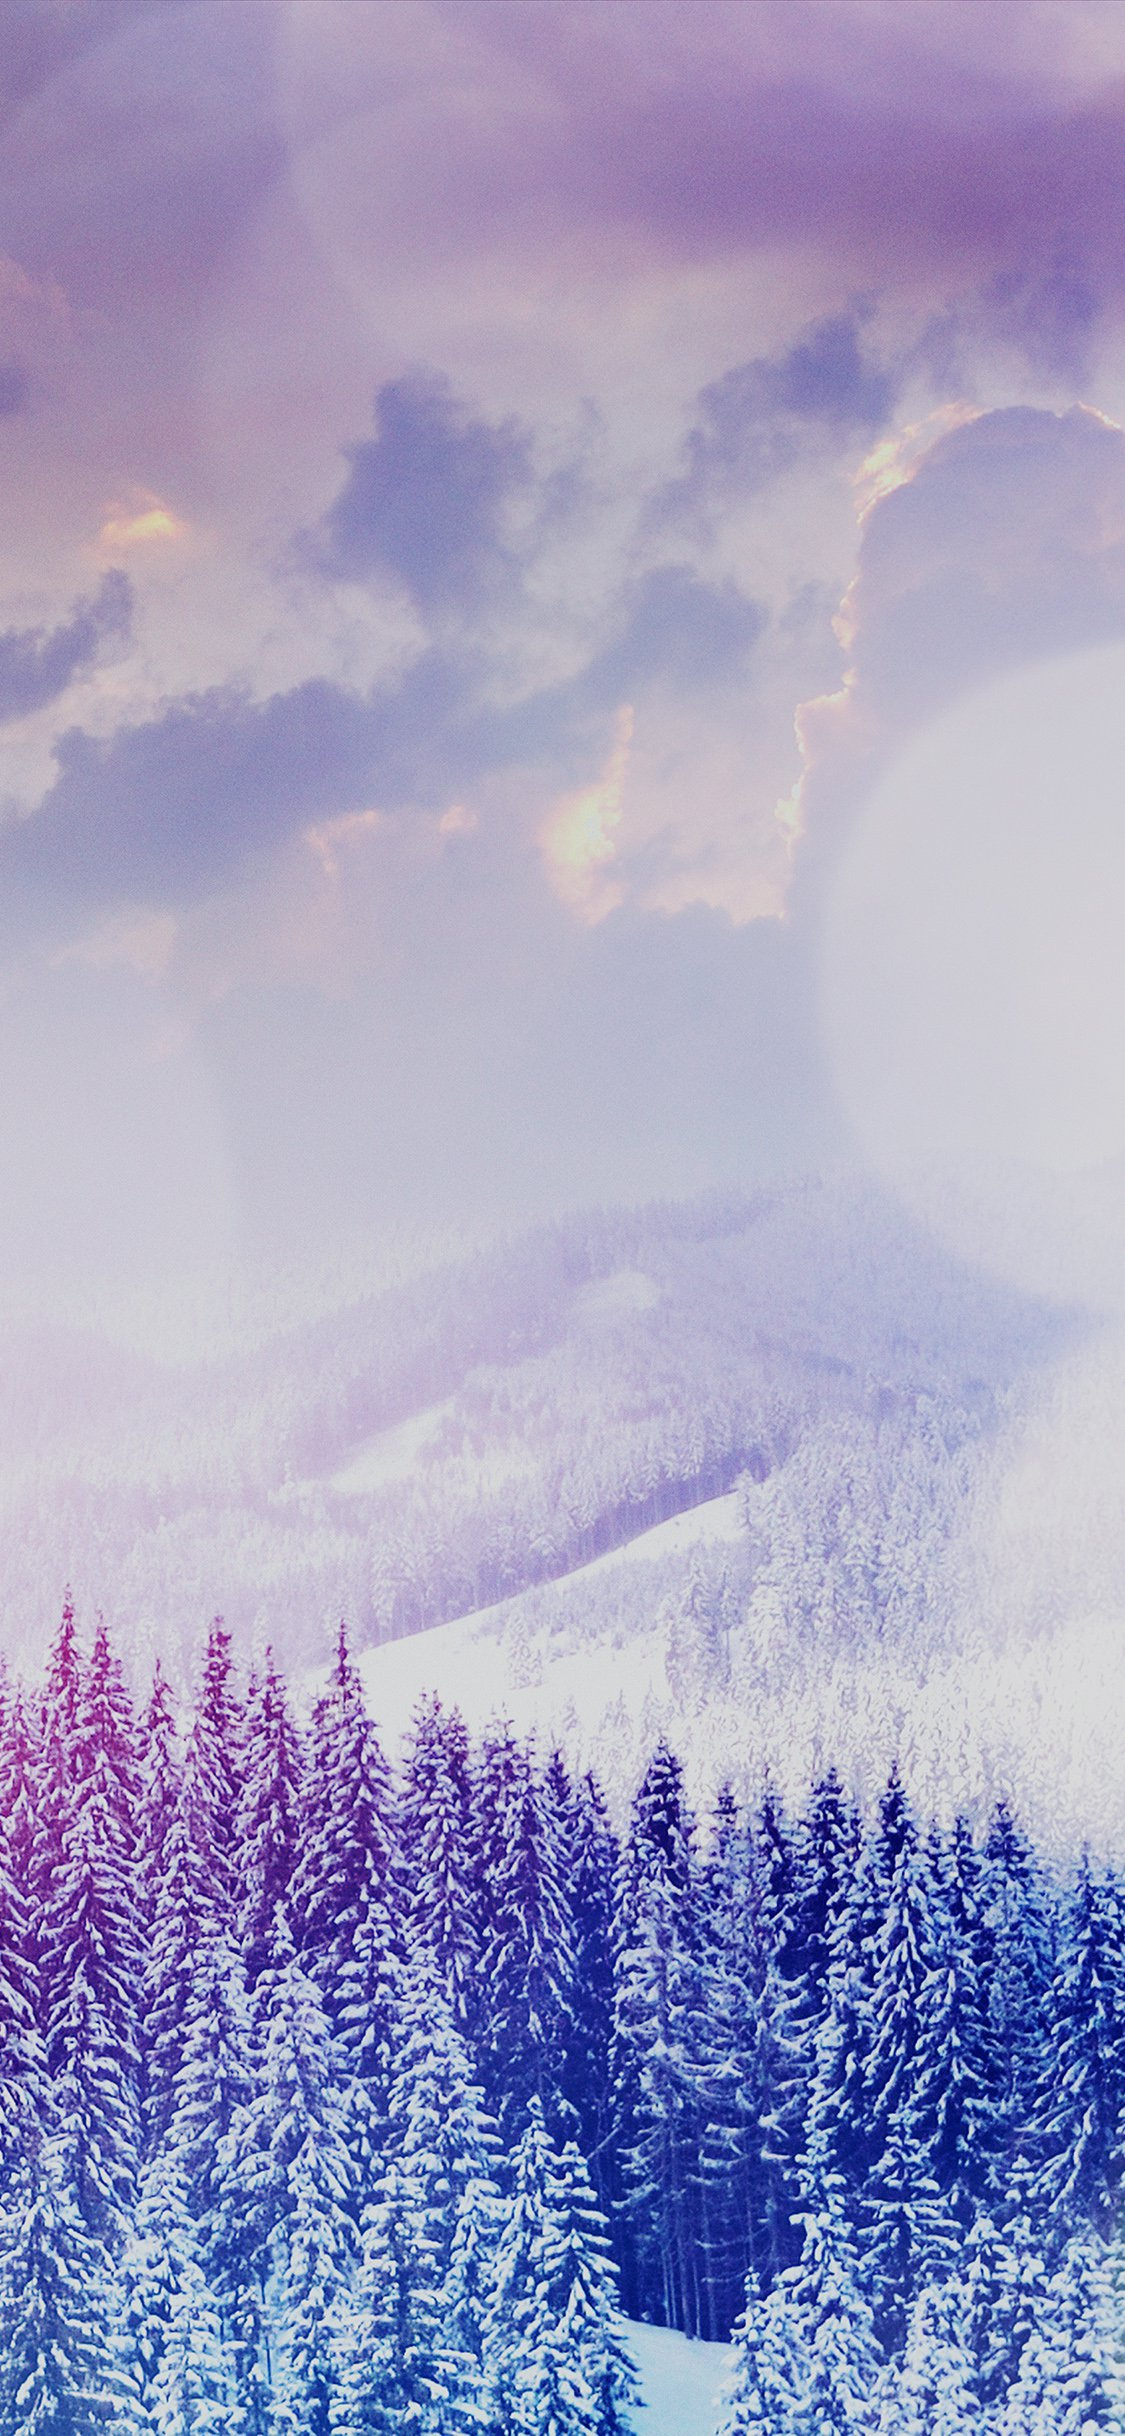 4k Winter Wallpapers For Iphone Ipad Or Macbook